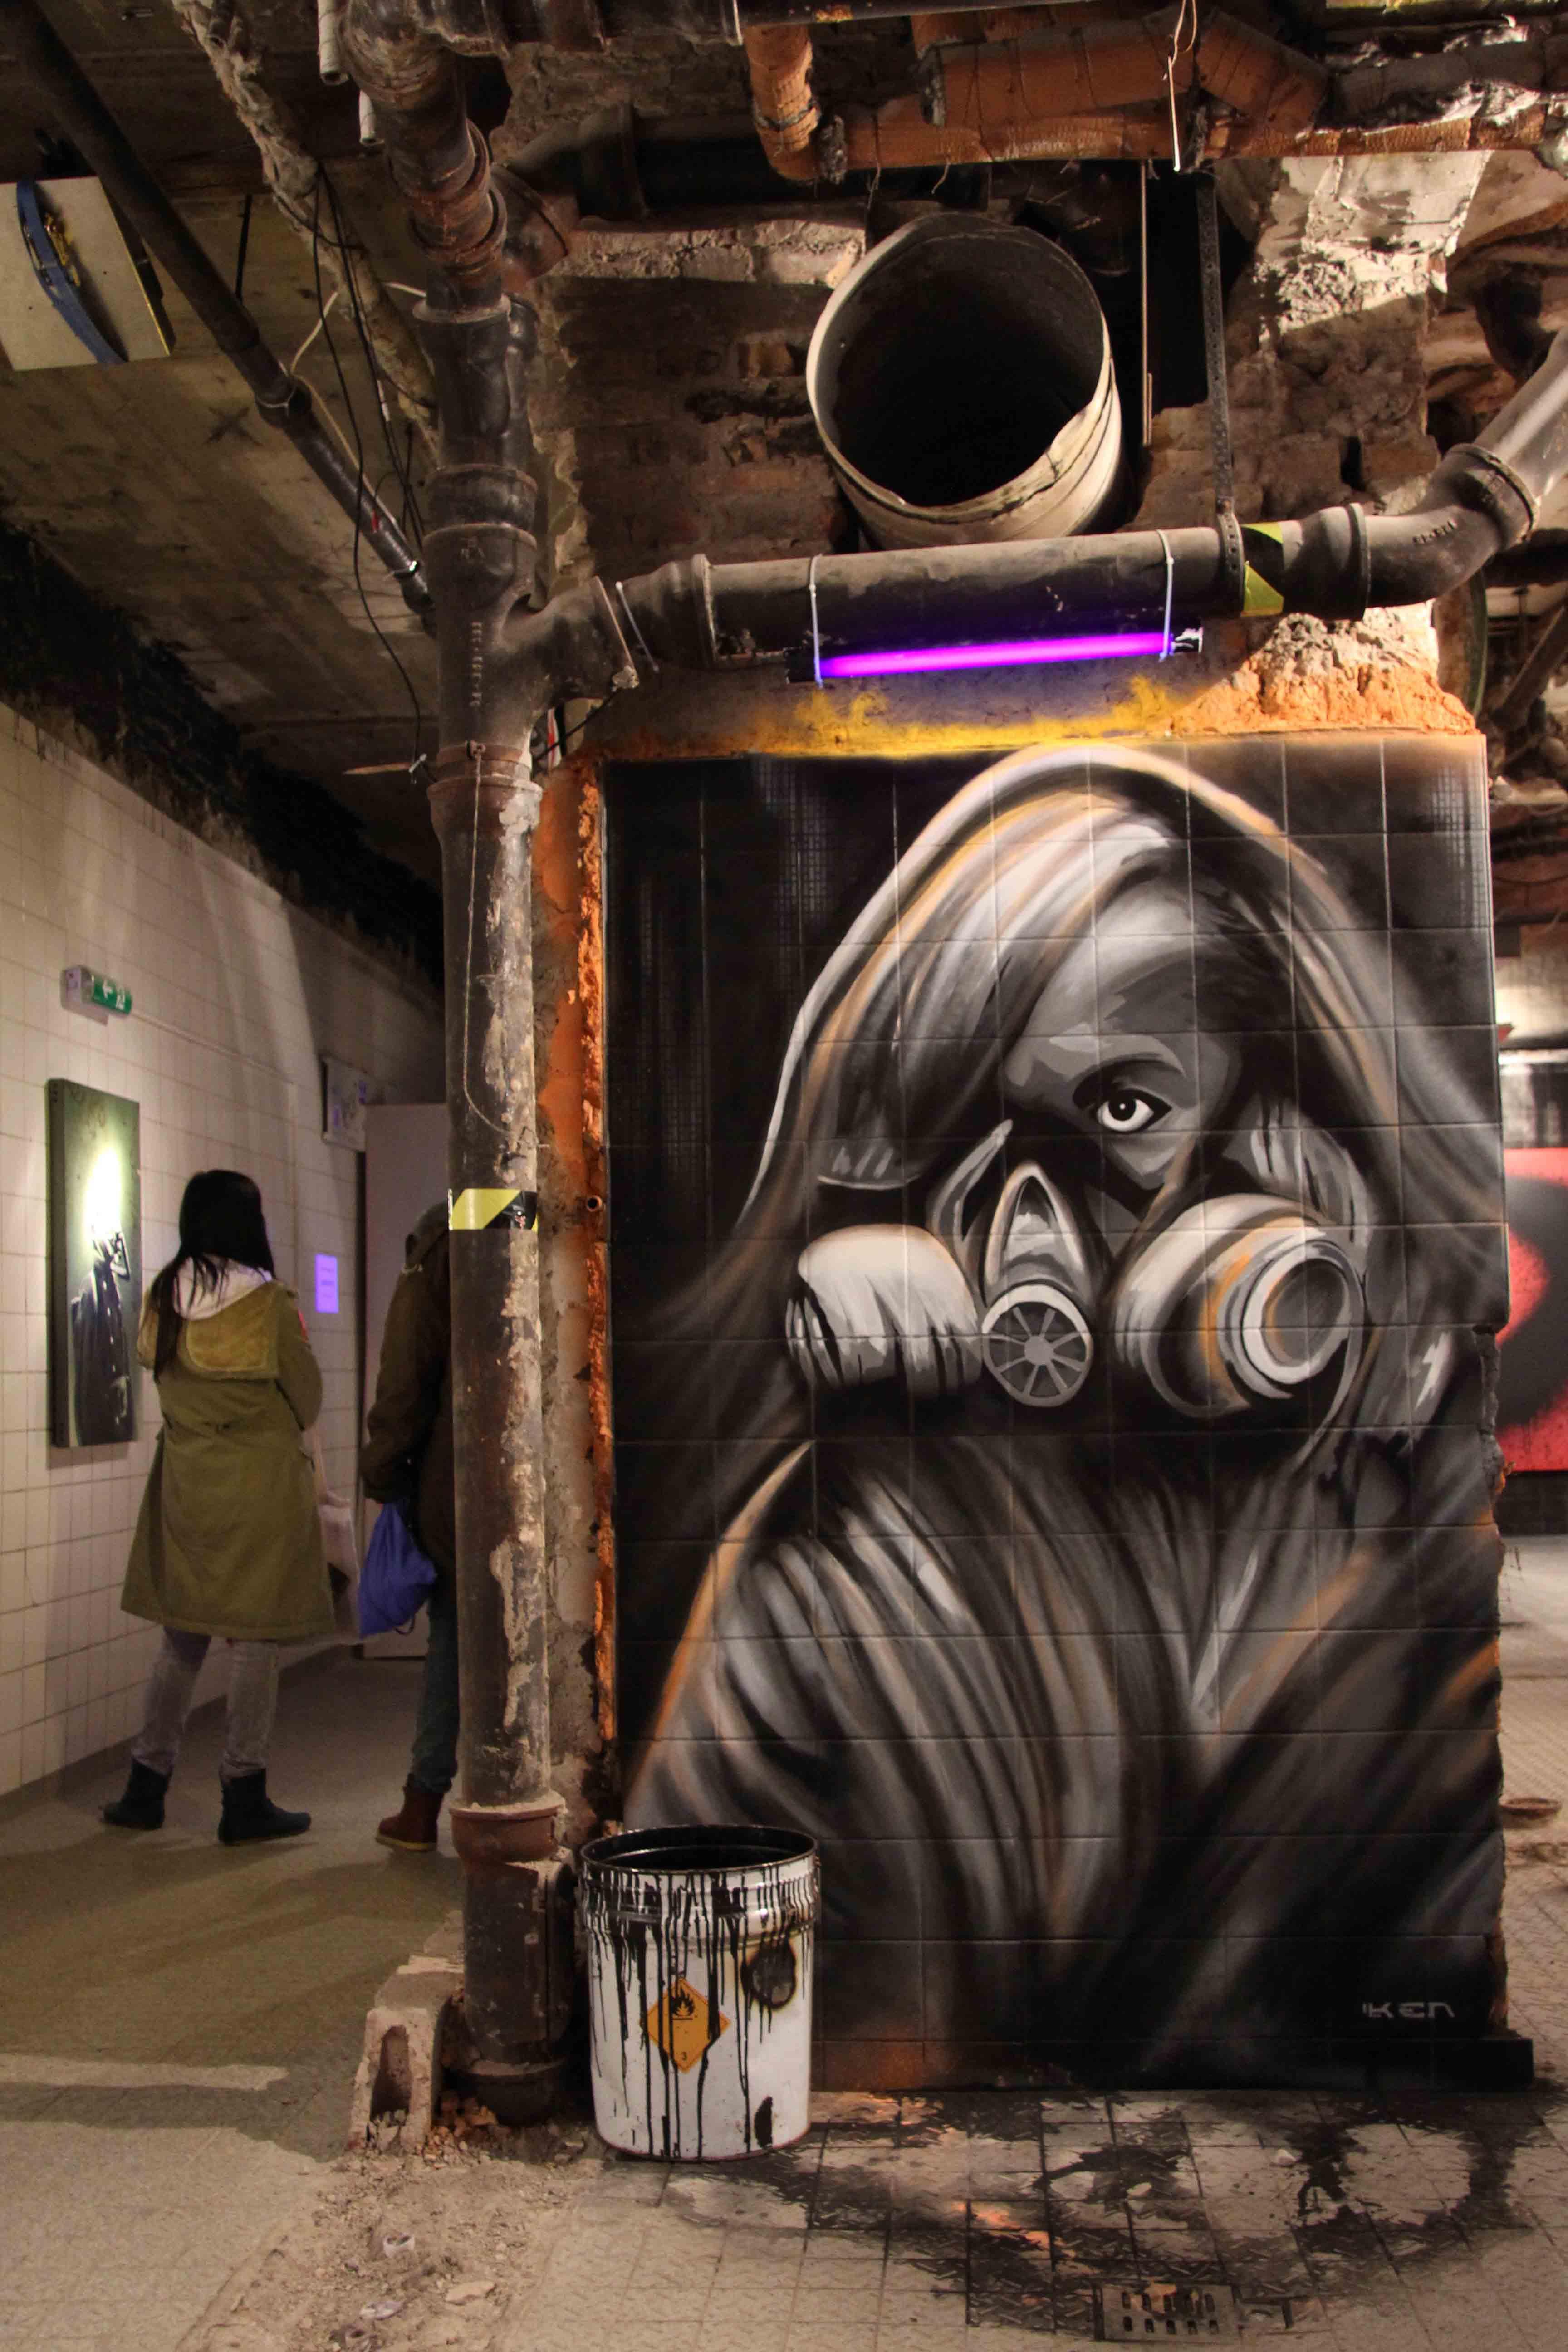 Behind The Mask - Art by KEN (aka Plotterroboter) at Stattmarkt at Stattbad Wedding in Berlin